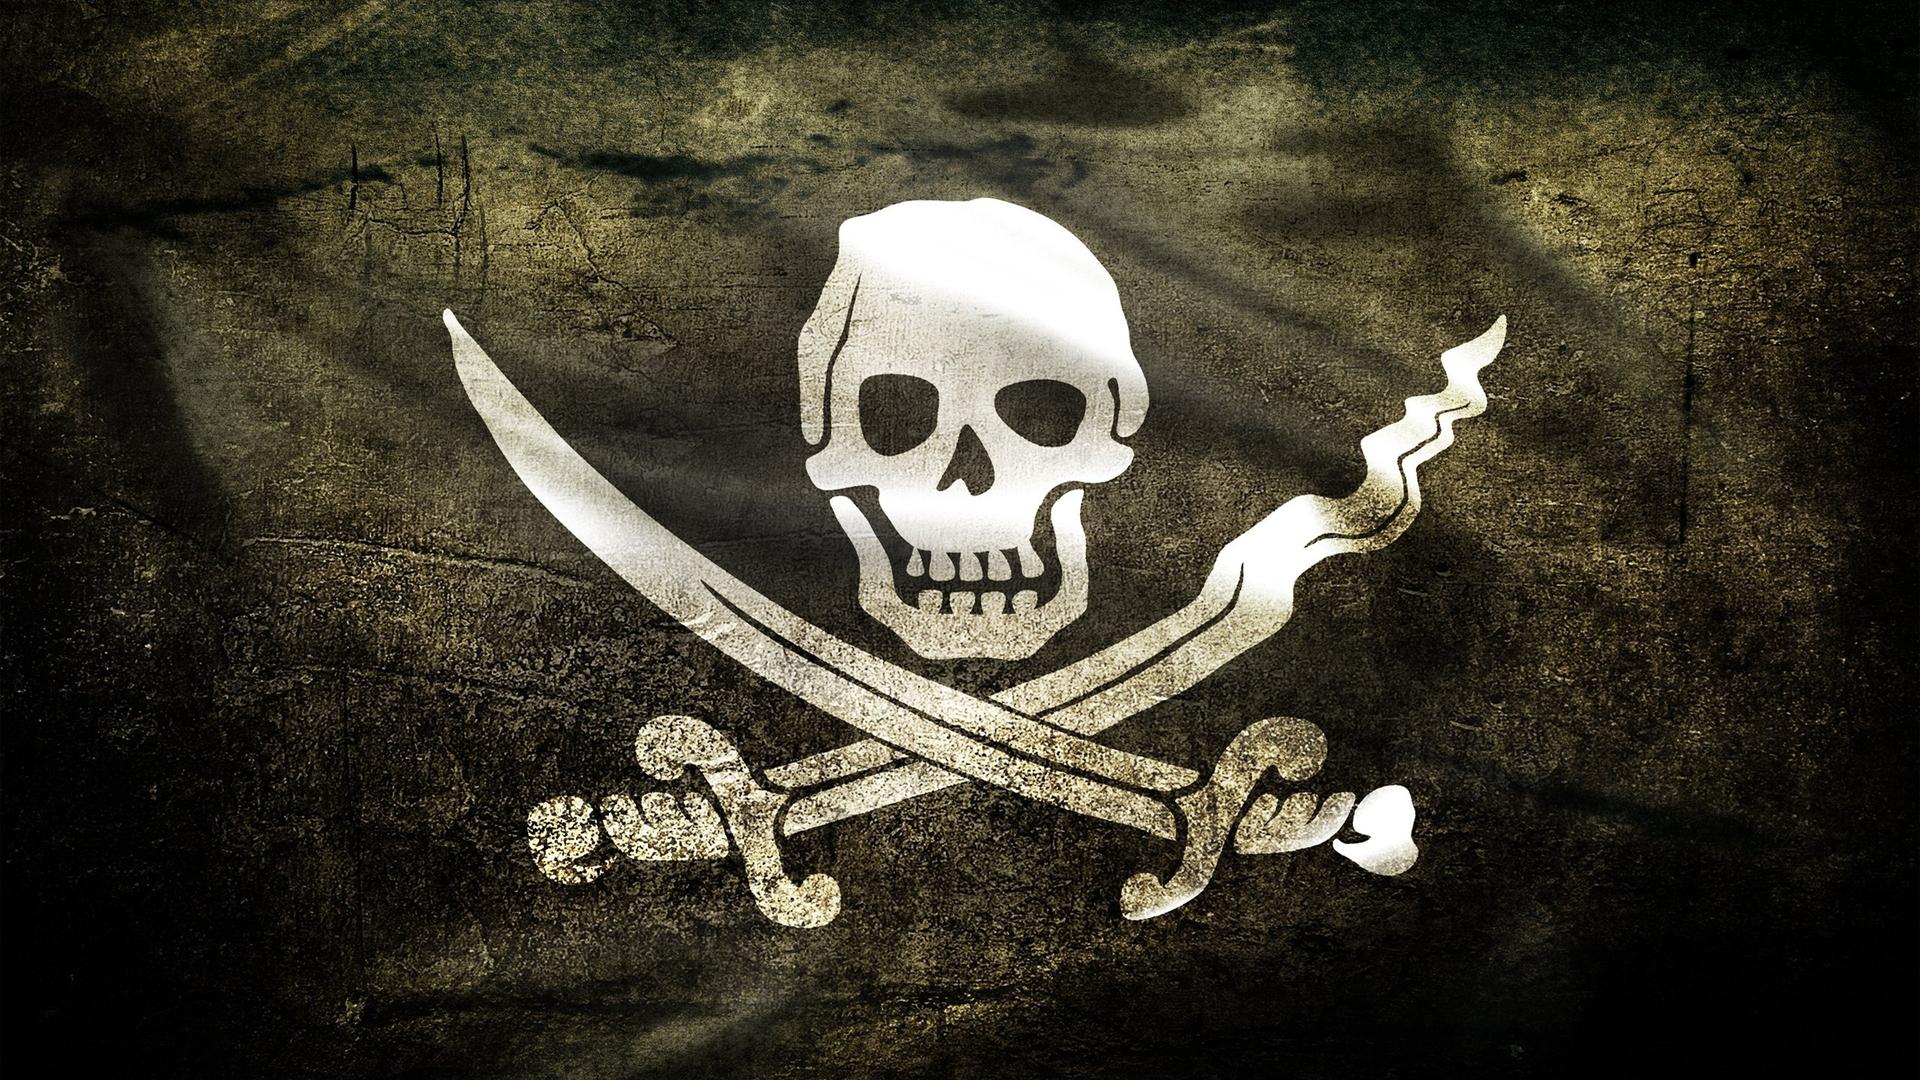 Pirate Skull Cross Bones Wallpaper | High Quality Wallpapers,Wallpaper ...